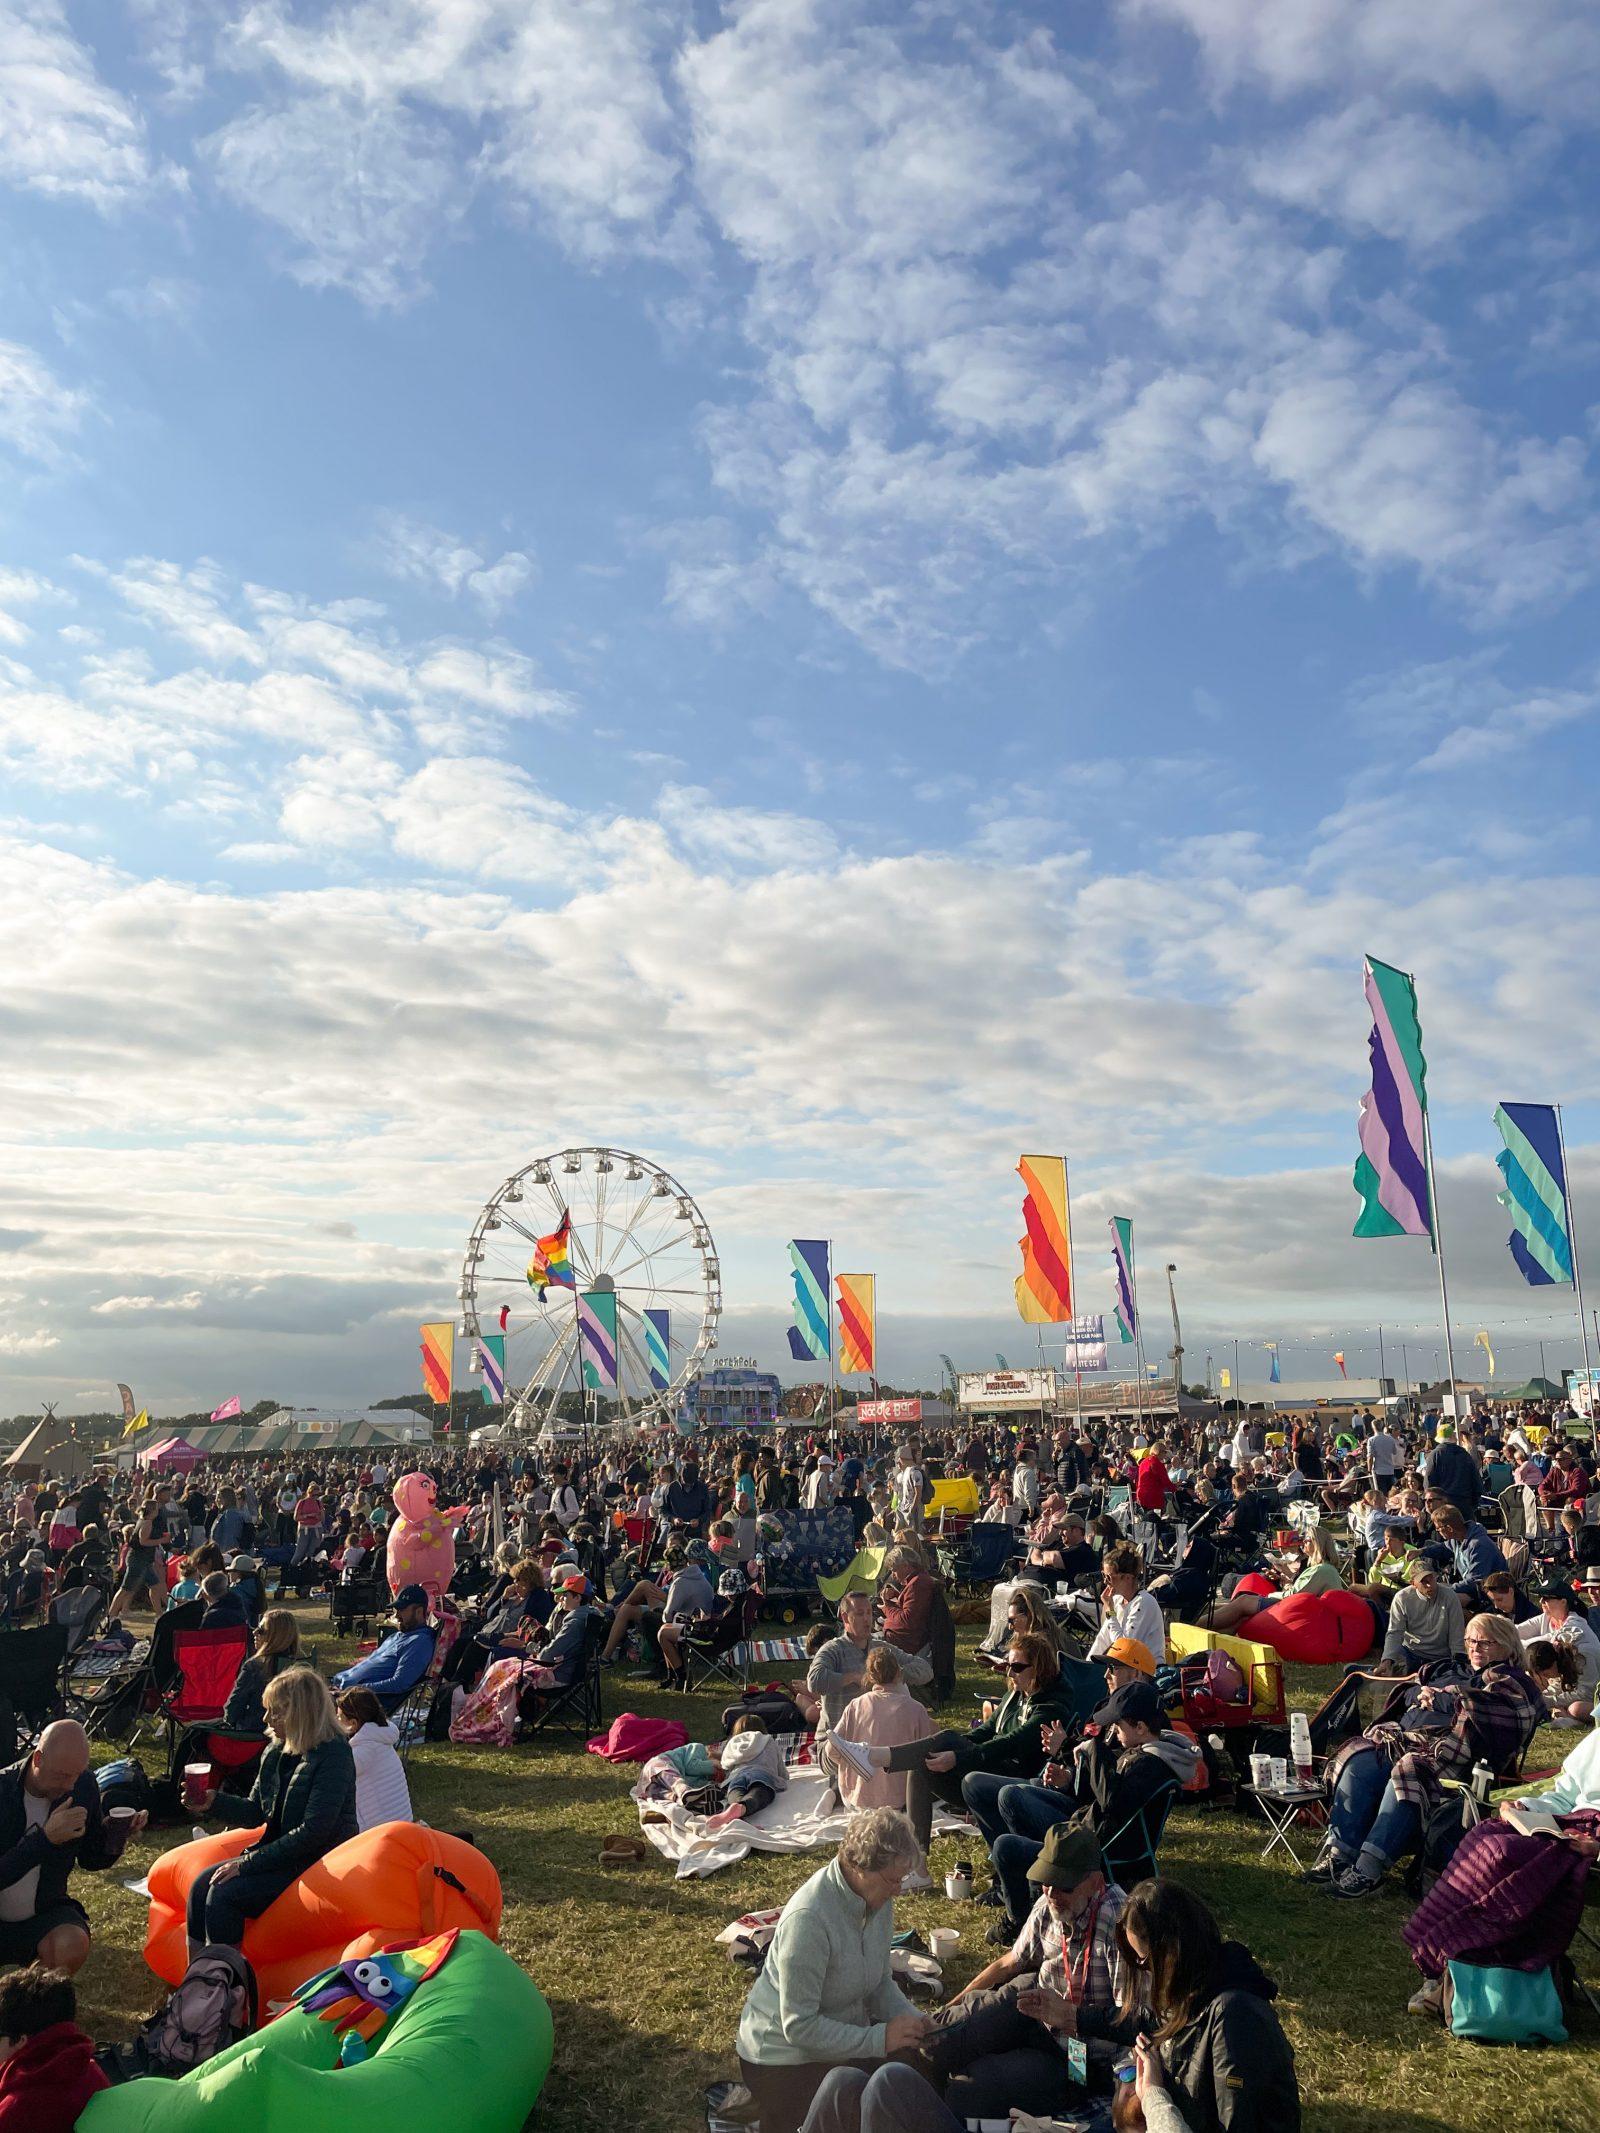 CarFest South Festival Crowd and Fairground